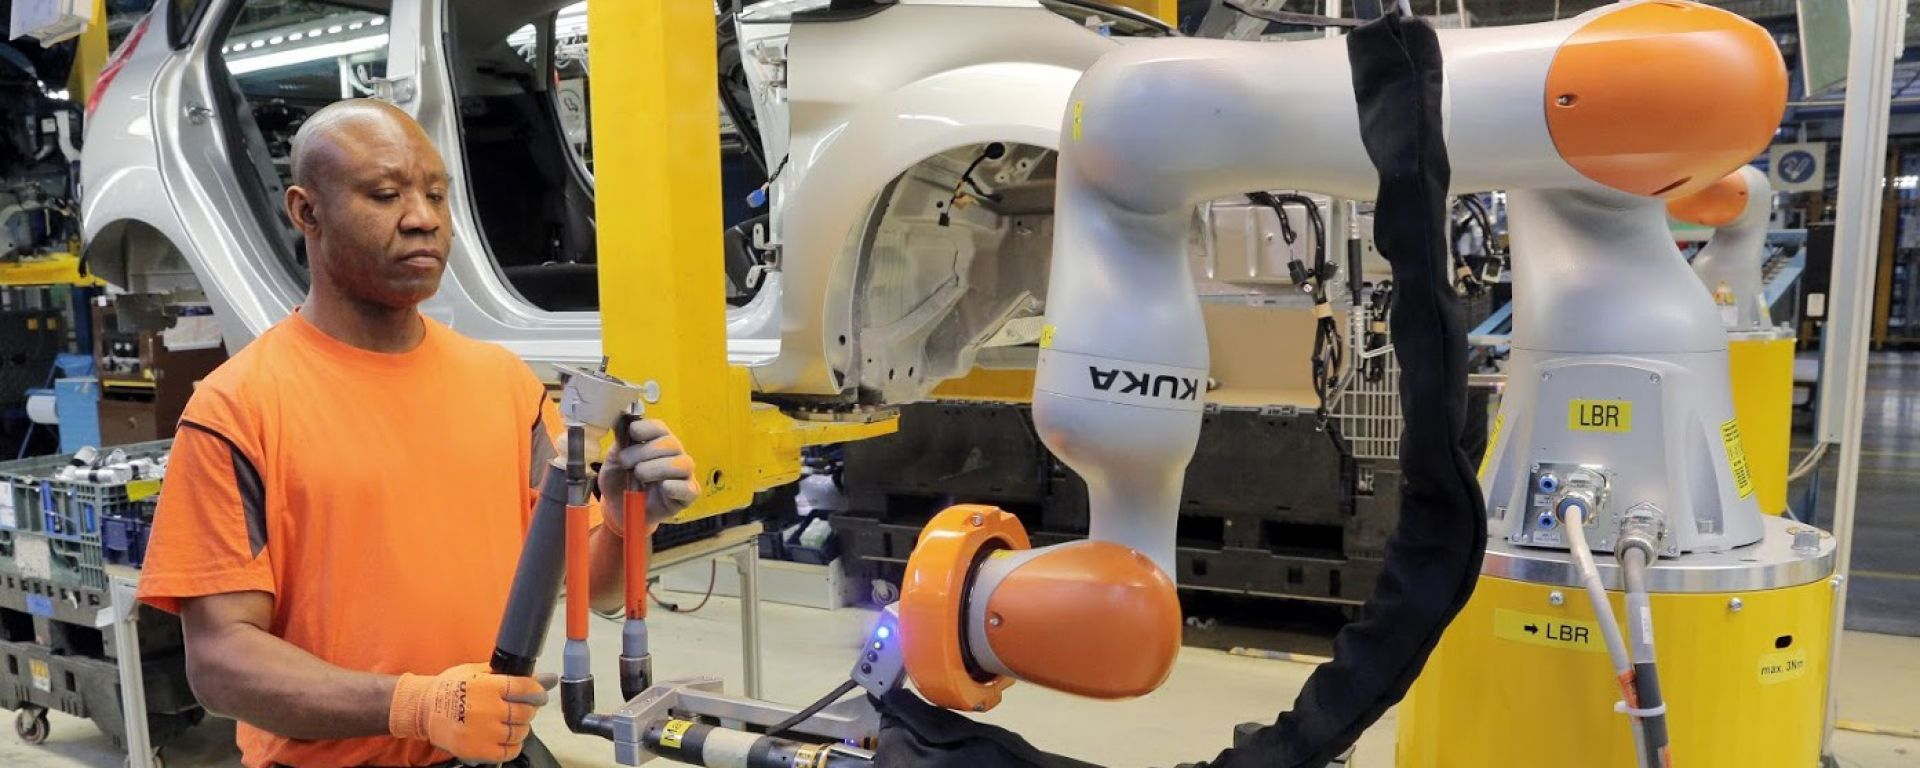 Ford e Kuka Roboter creano i Co-bot: partner degli operai